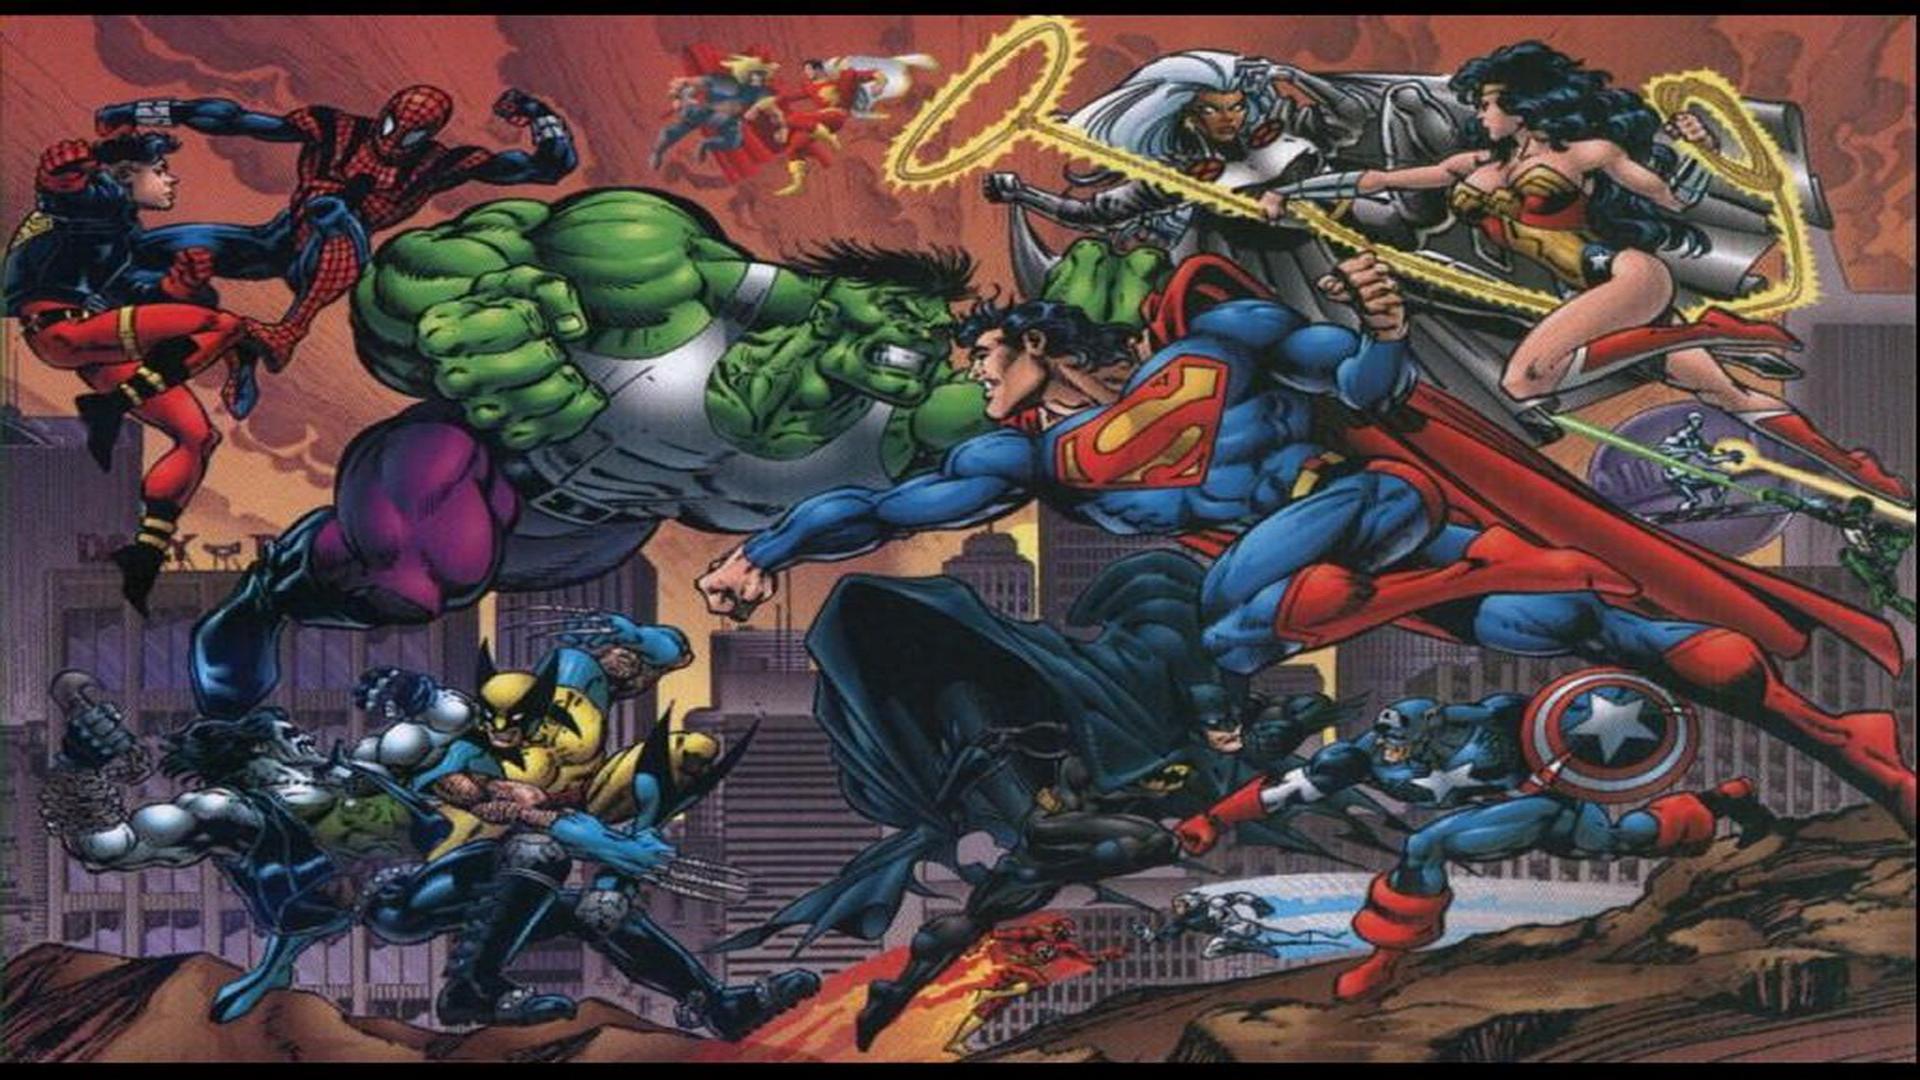 DC Comics Wallpapers DC vs Marvel dc comics 251200 1024 768 Pictures 1920x1080